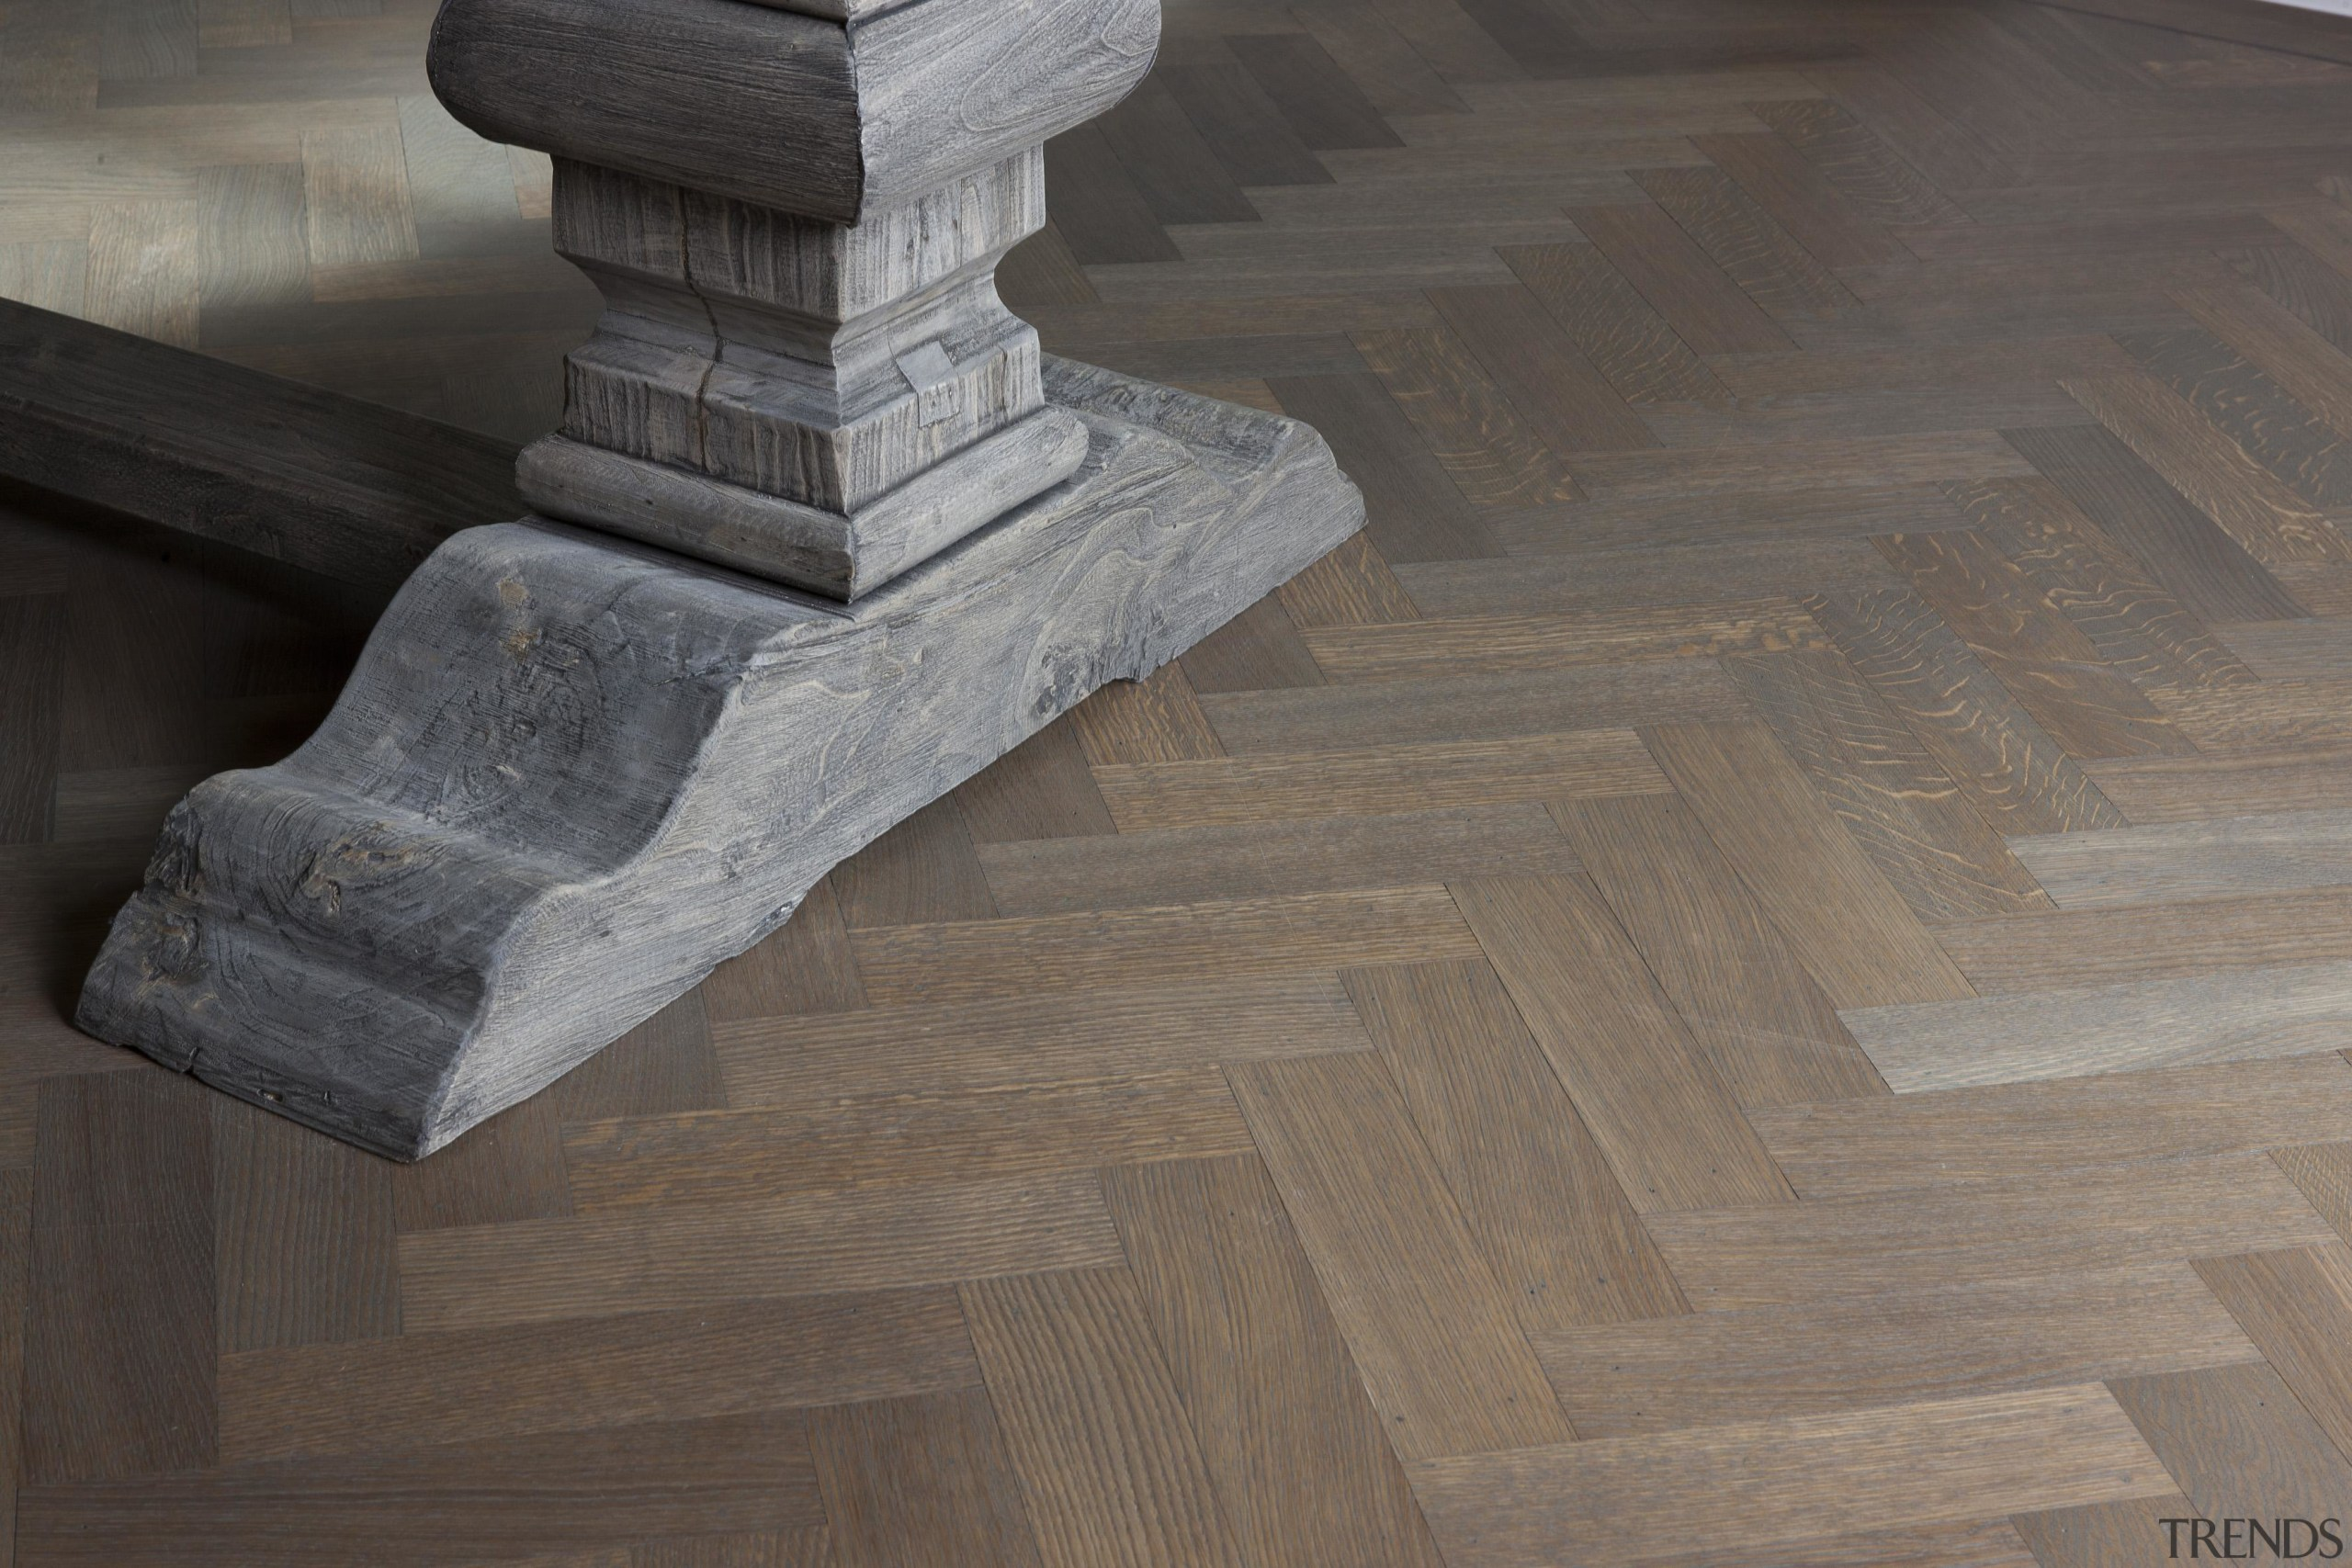 Oak Herringbone Oiled Parquet Wood Floor - floor floor, flooring, hardwood, wood, gray, black